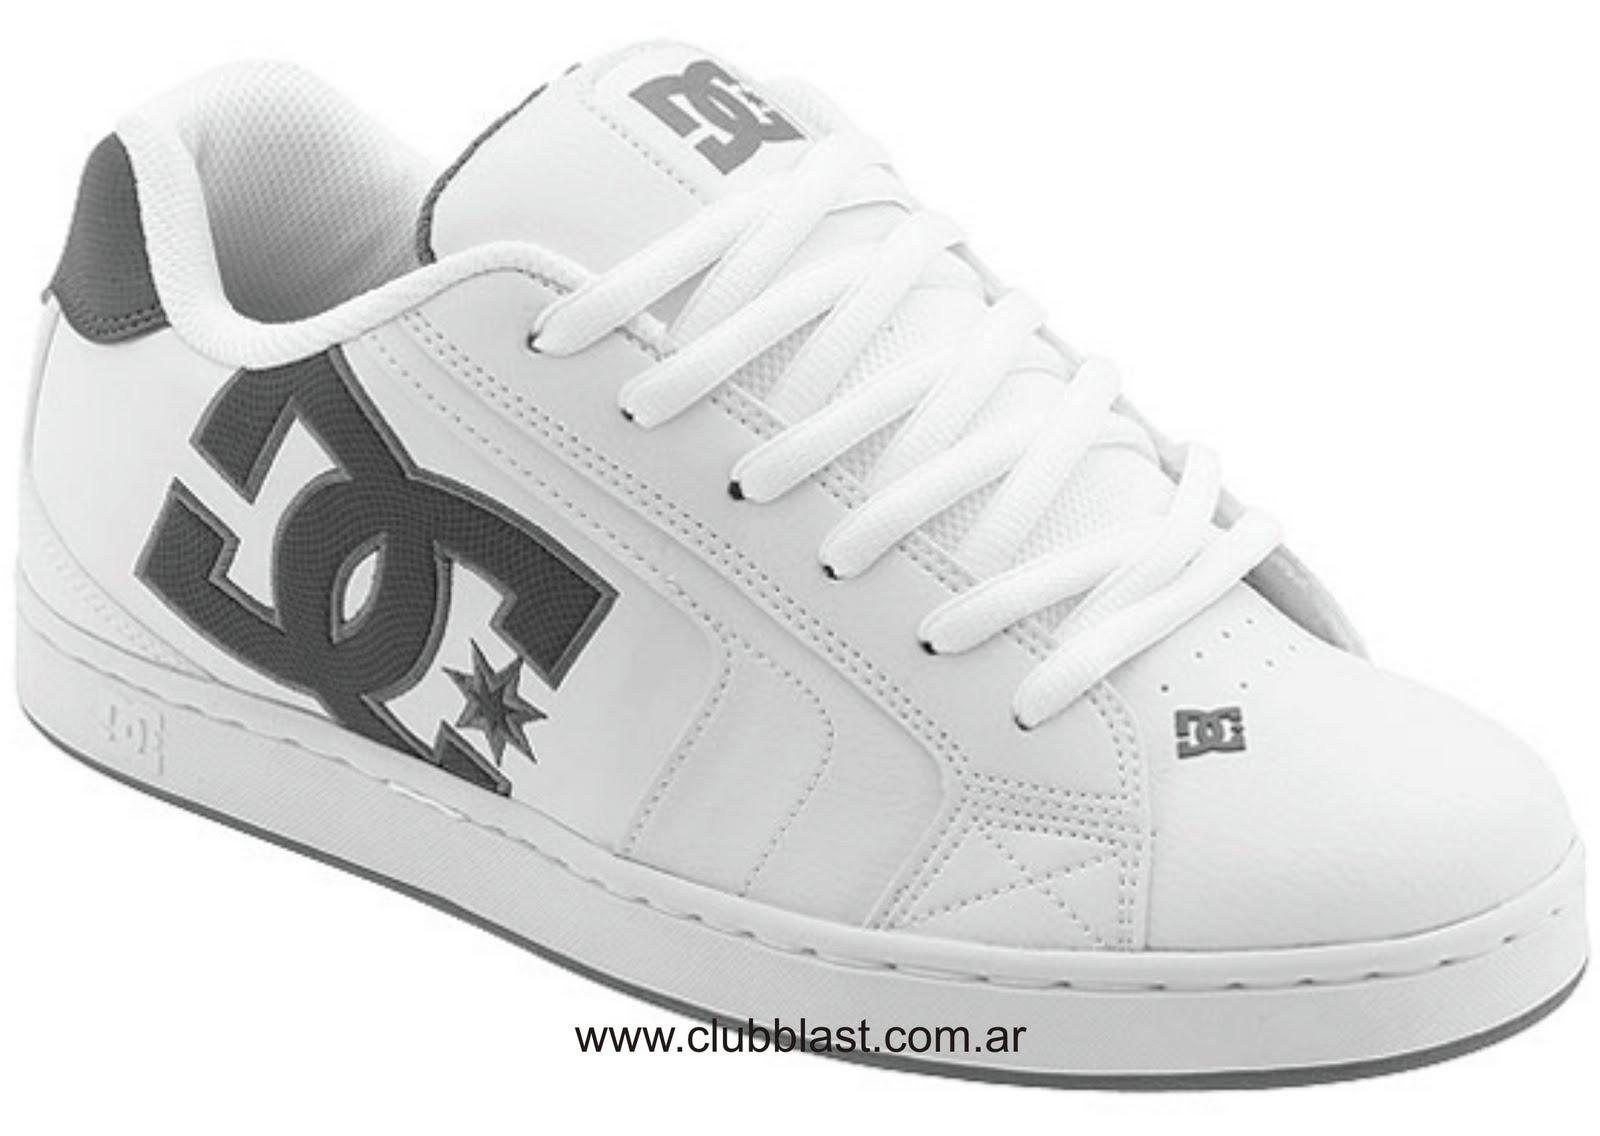 http://4.bp.blogspot.com/-rZYmhnhixFA/TptJFSeQy6I/AAAAAAAAAb8/sKMGsJts7Po/s1600/tenis-dc-white-blanco.jpg